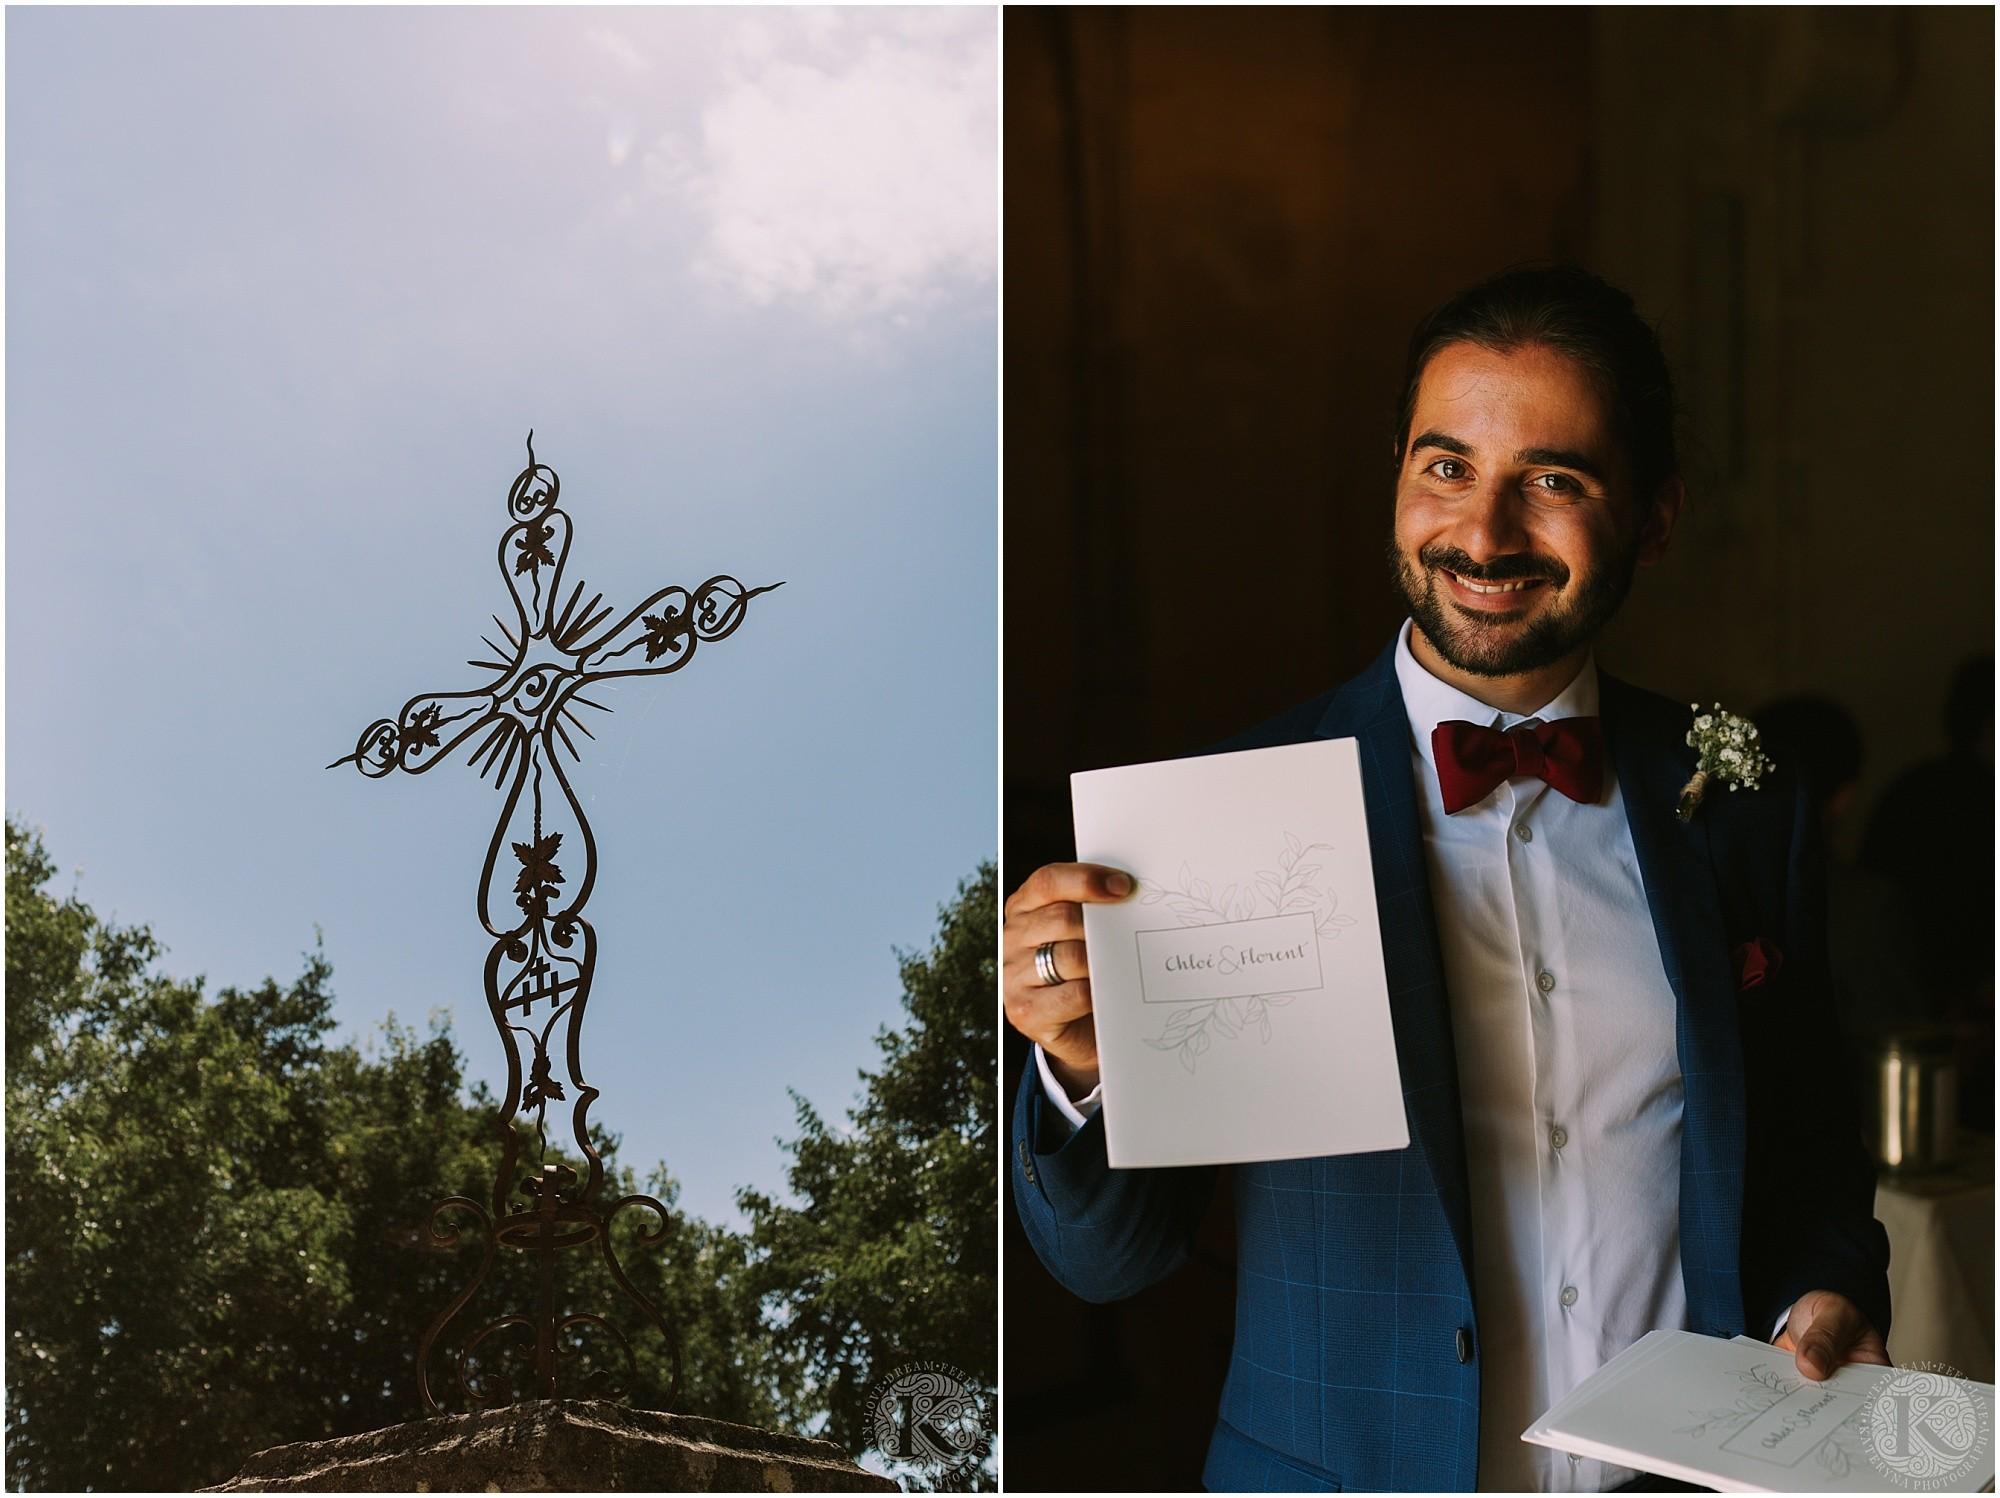 Kateryna-photos-photographe-mariage-vaucluse-provence-avignon-ferme-st-hugues_0028.jpg